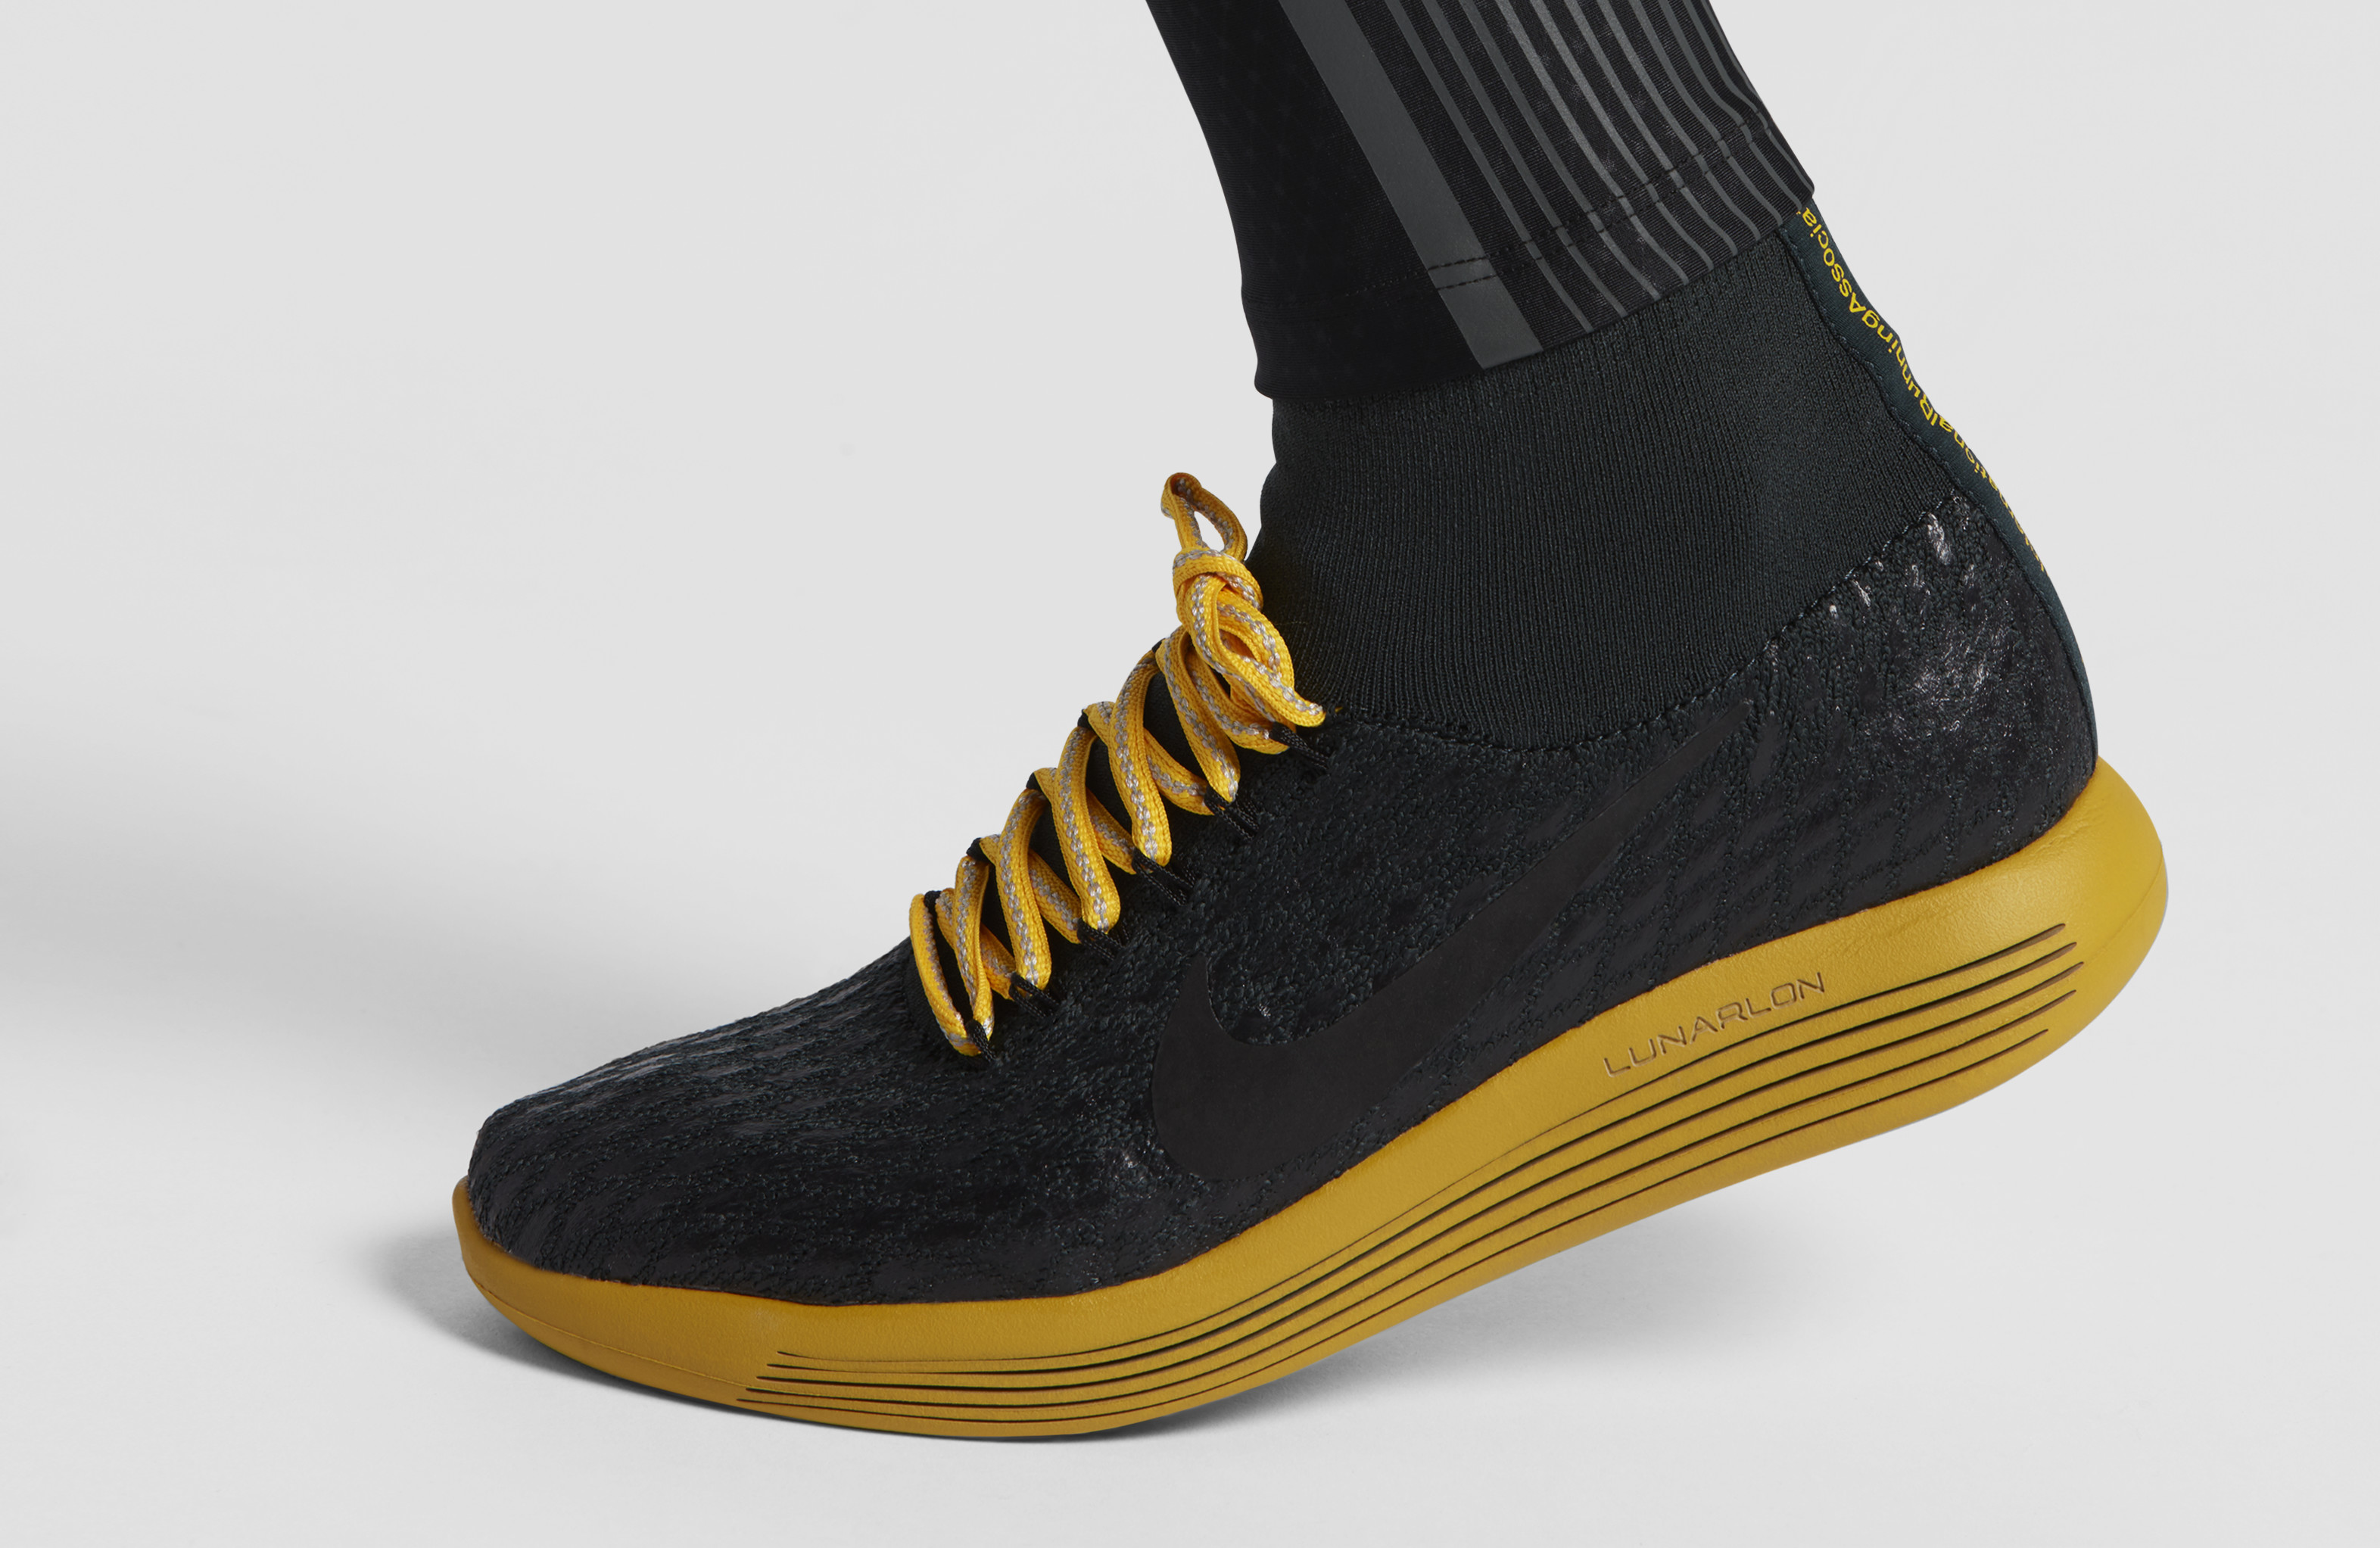 Gyakusou Nike LunarEpic Flyknit